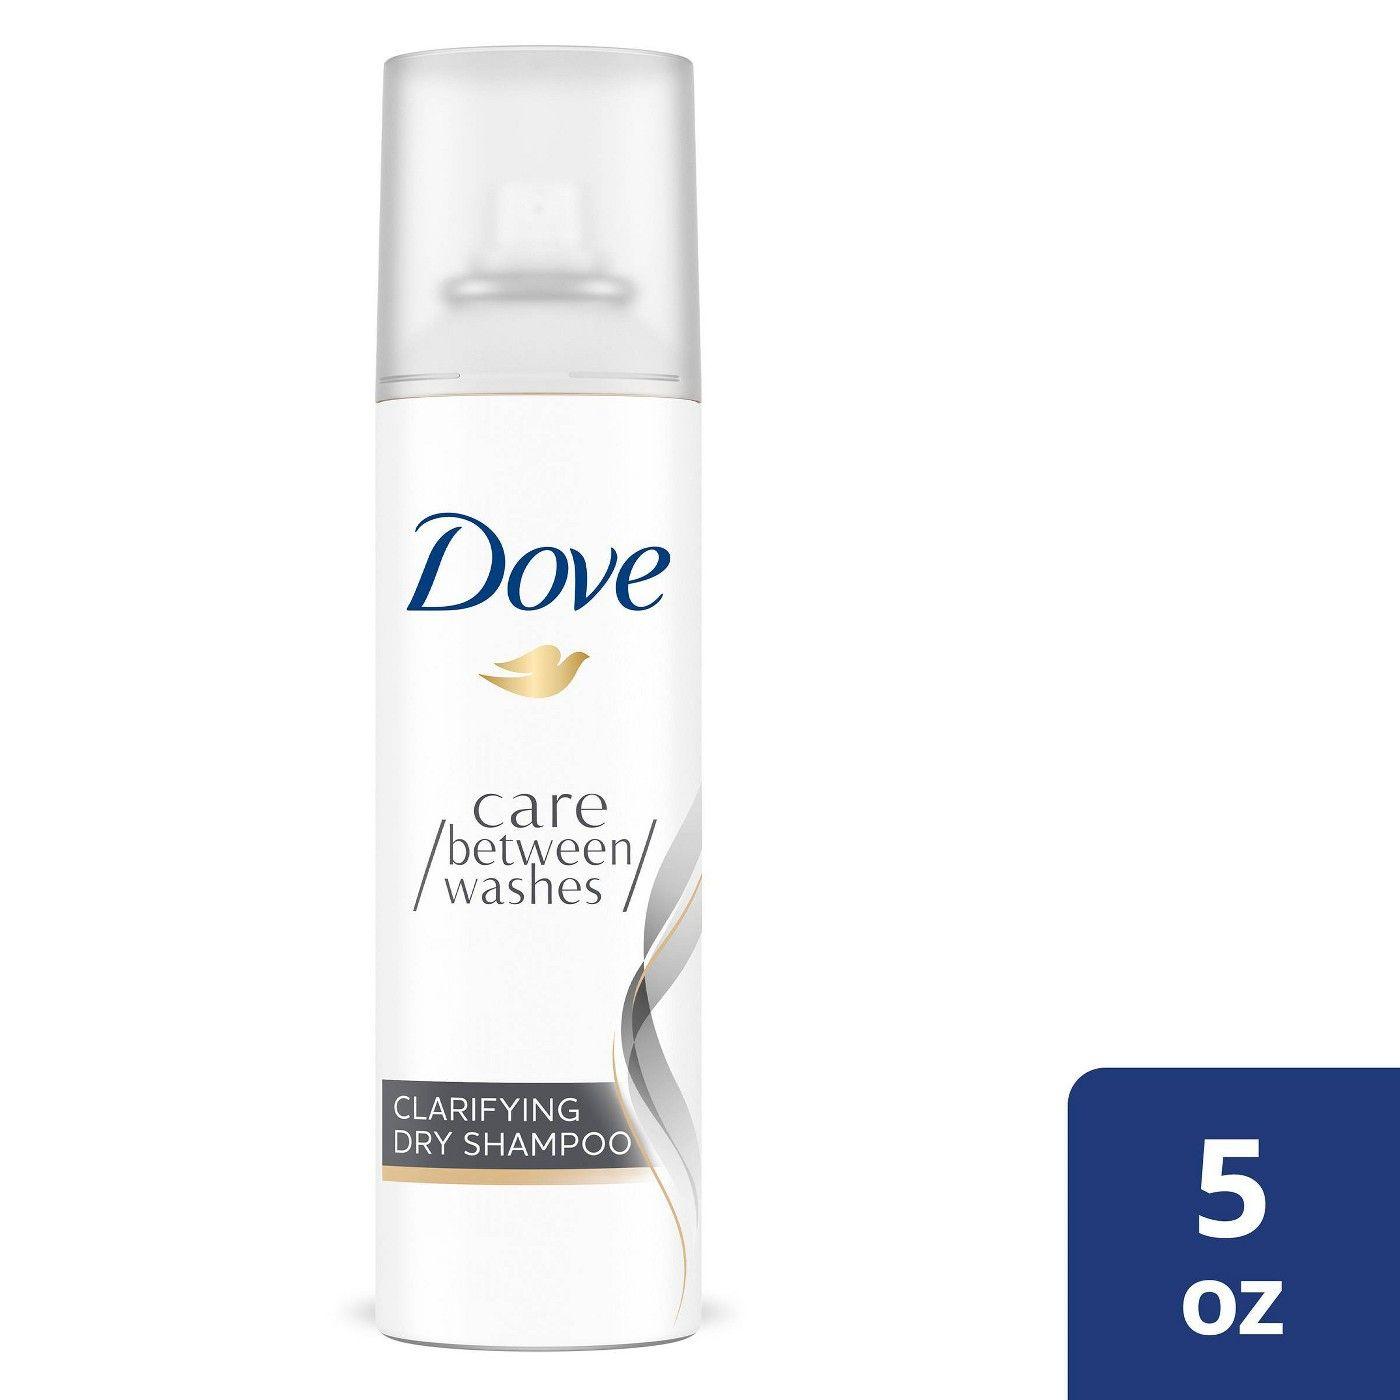 Dove Clarifying Charcoal Dry Shampoo 5oz Affiliate Charcoal Ad Clarifying Dove Dry Shampoo Dove Dry Shampoo Waterless Shampoo